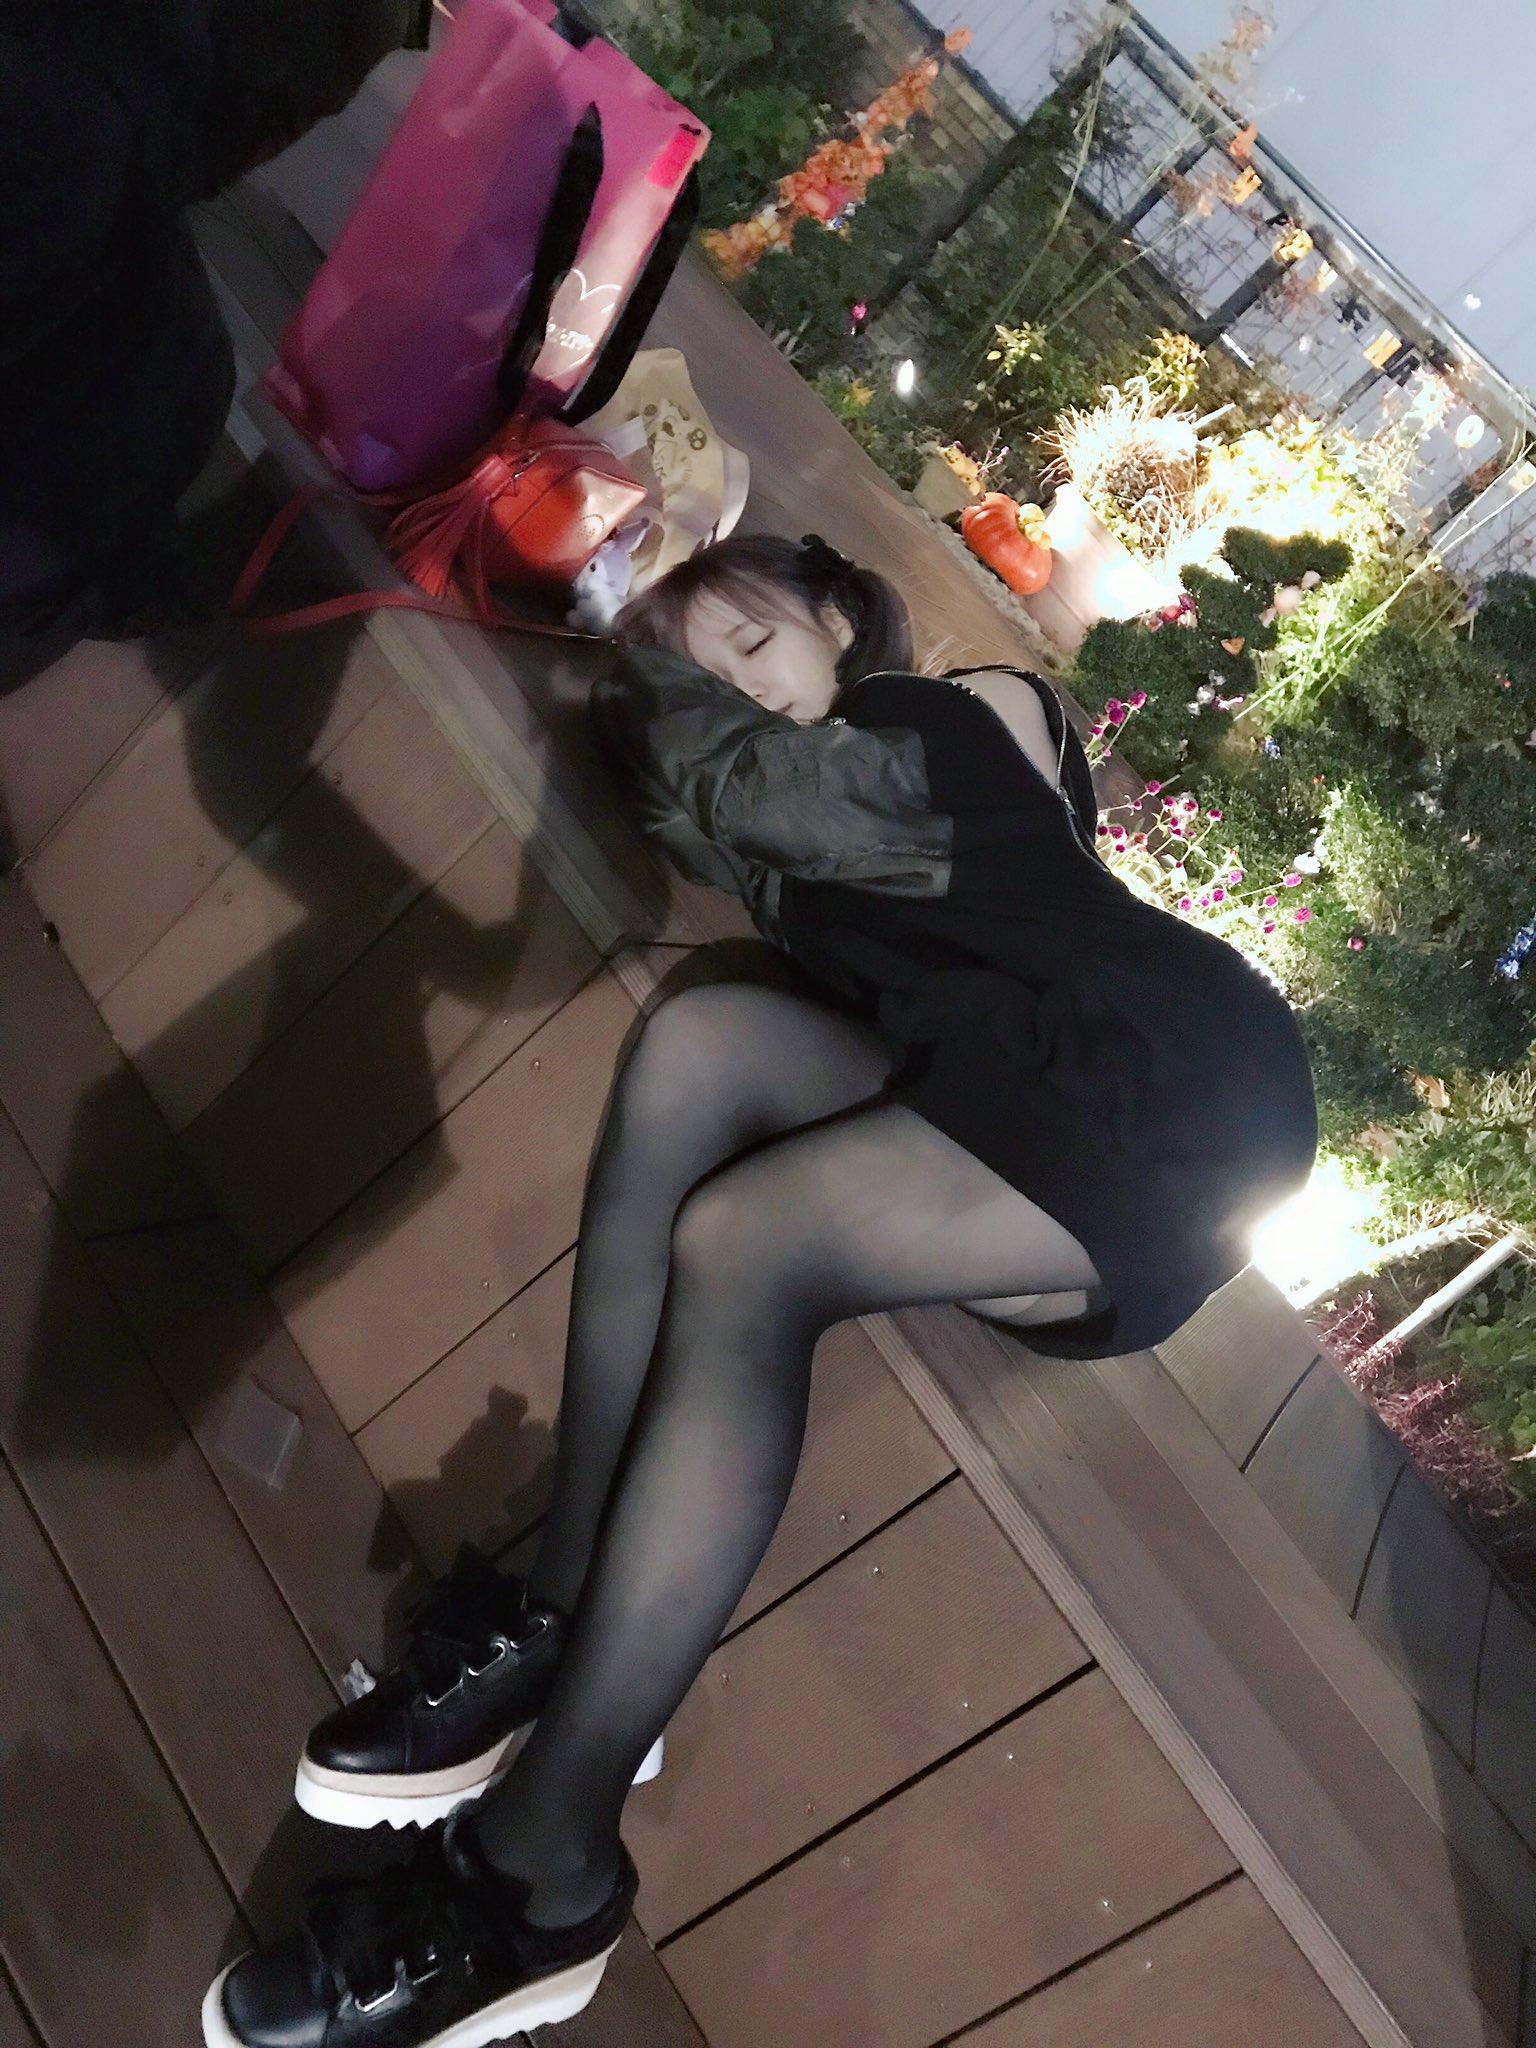 童颜巨乳COSER小姐姐yami推特图集 Yami-twitter9(14)